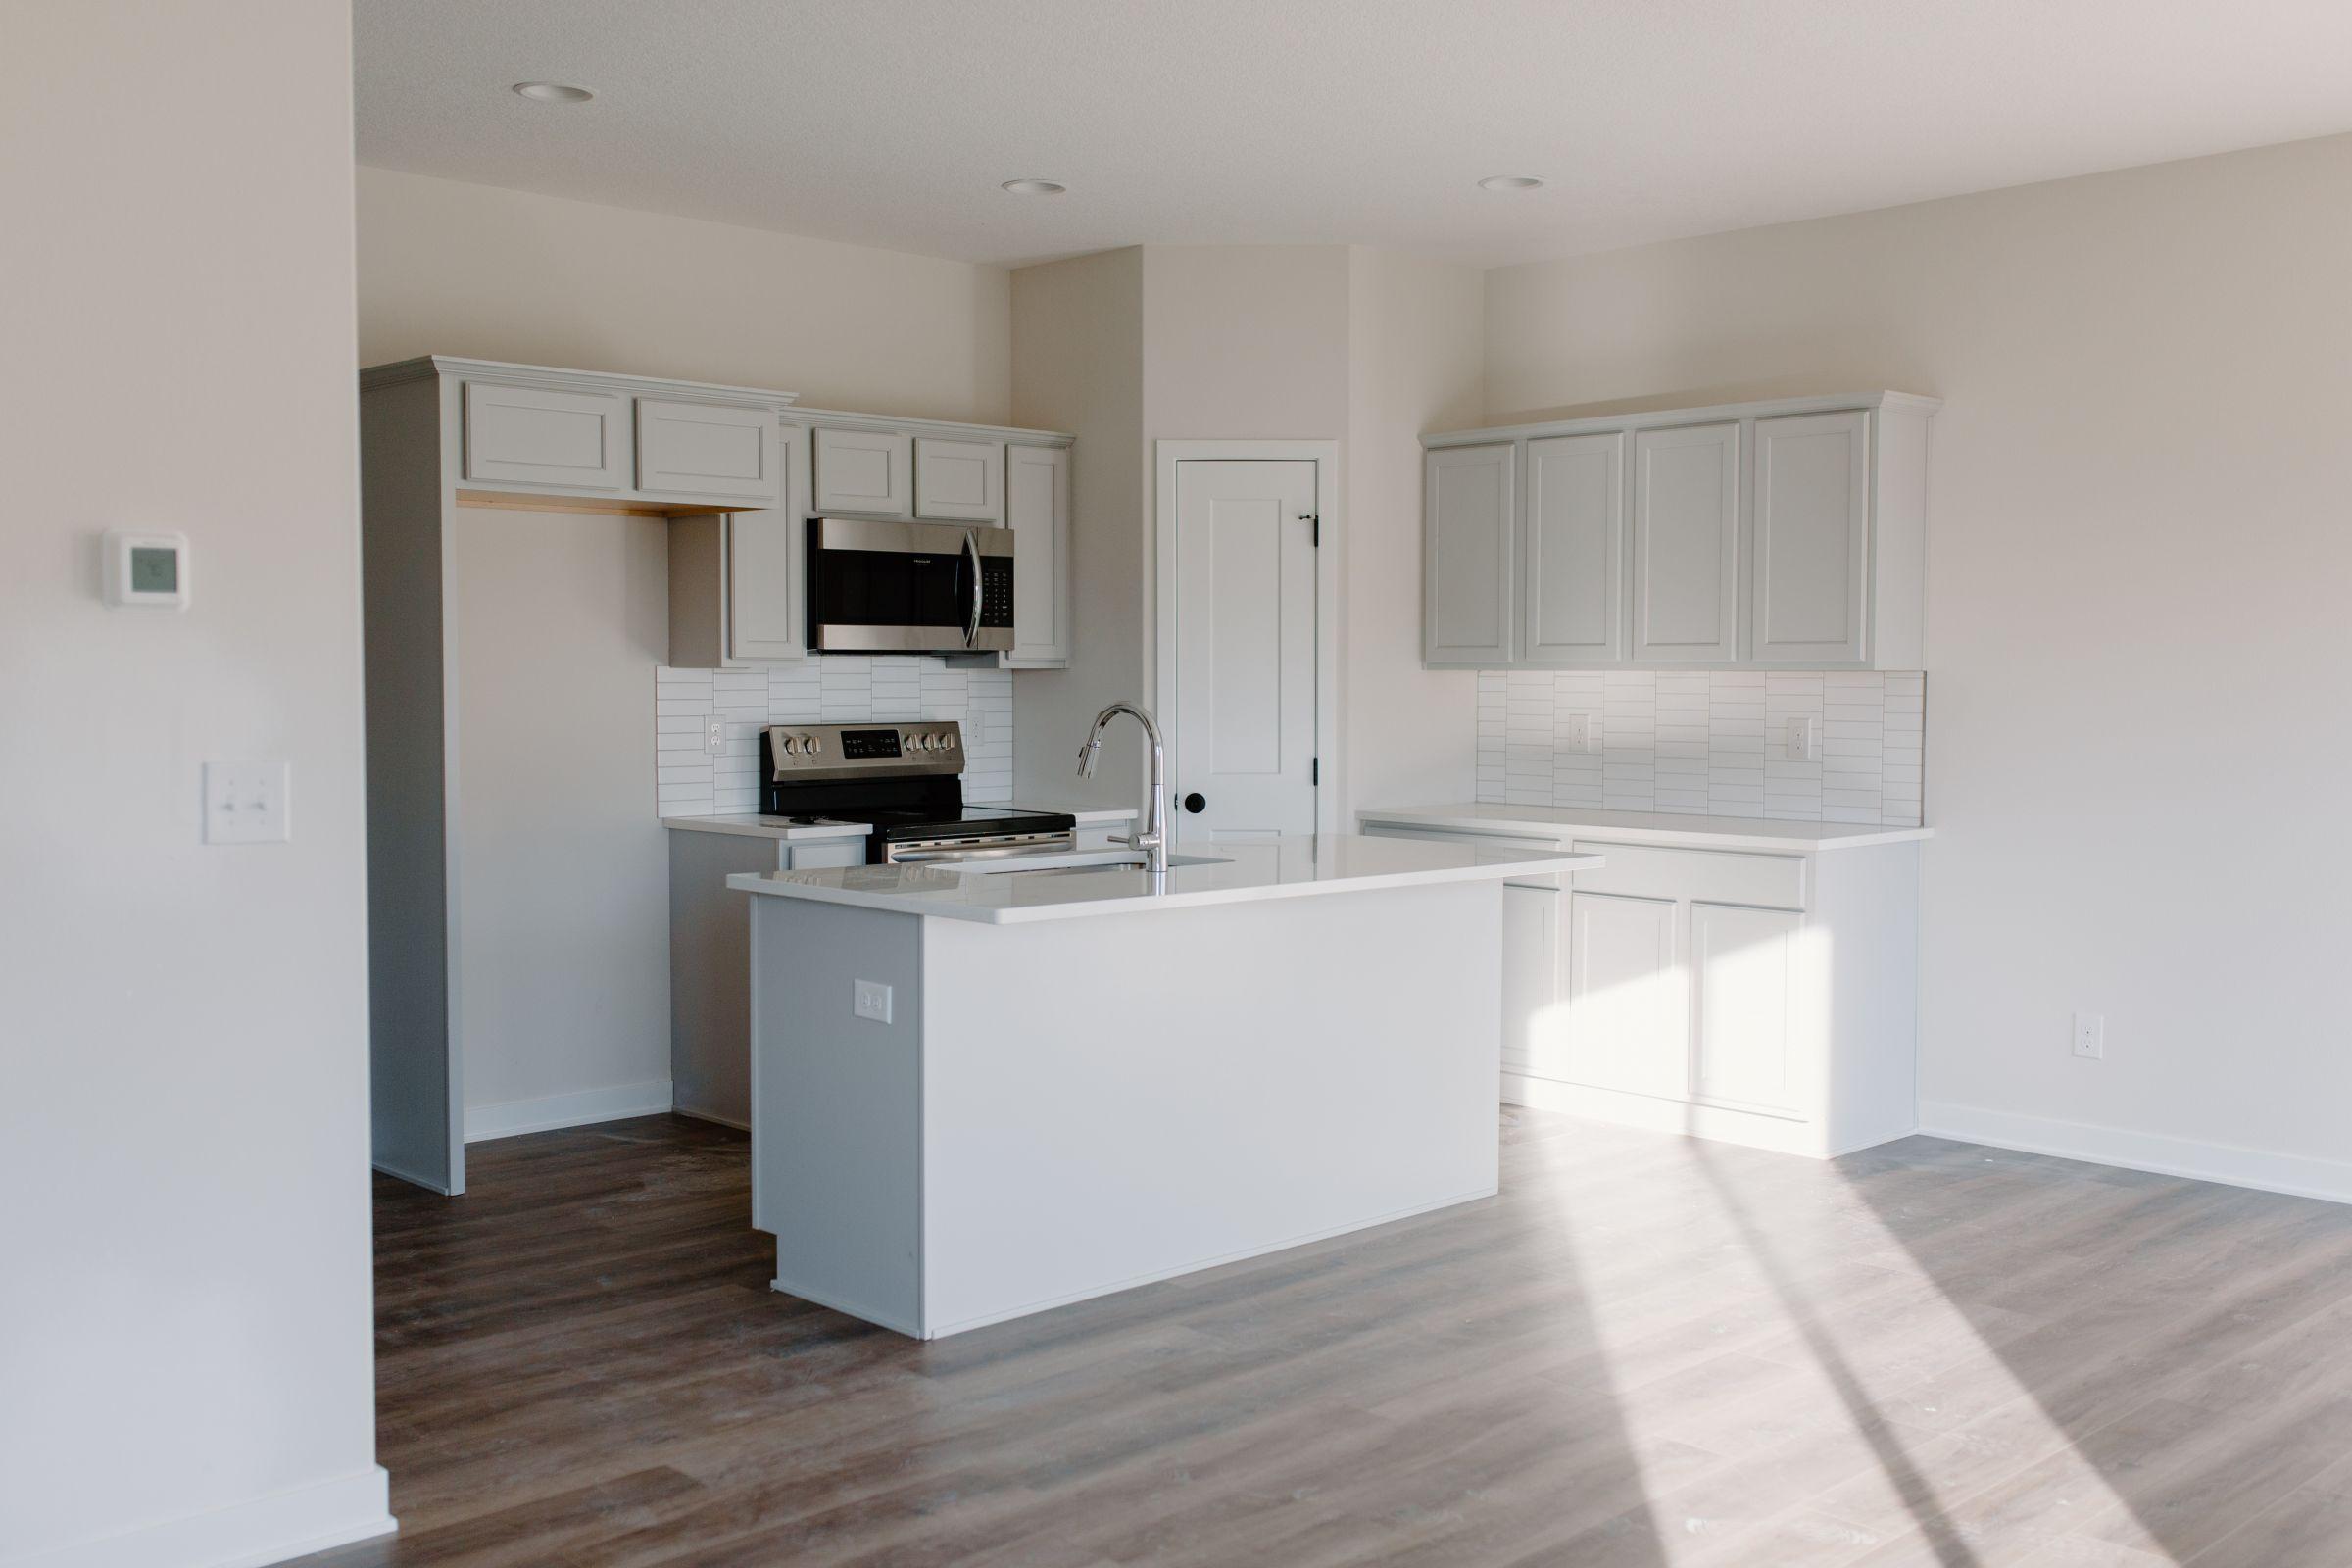 residential-warren-county-iowa-0-acres-listing-number-15367-2-2021-02-18-210356.jpg